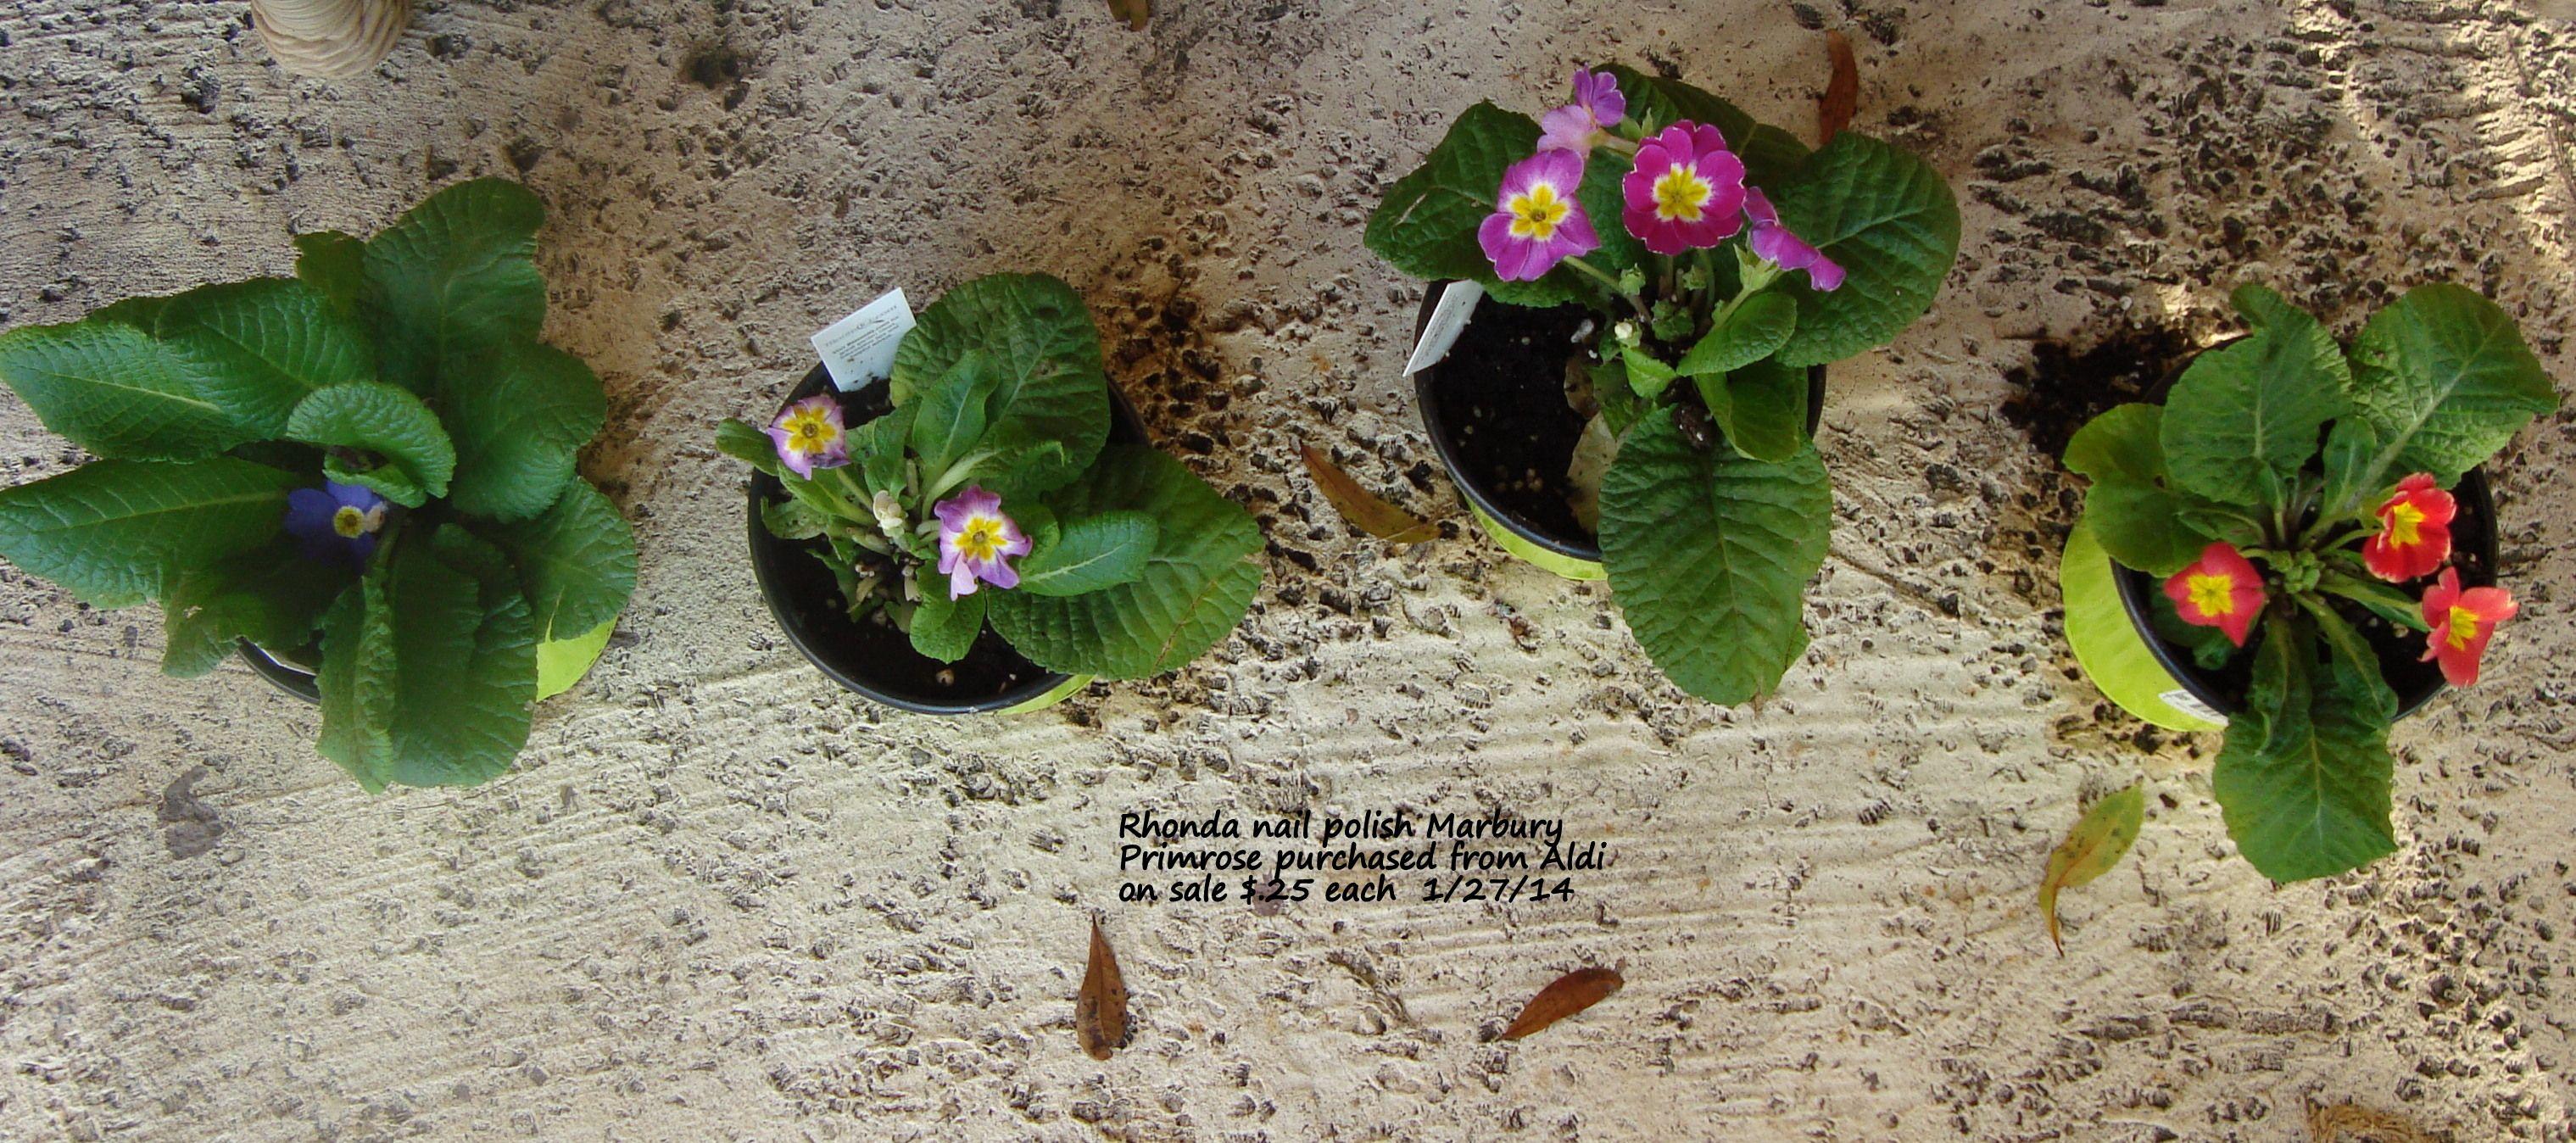 Primrose From Aldi 1 27 14 25 Each Plant Care Plants 400 x 300